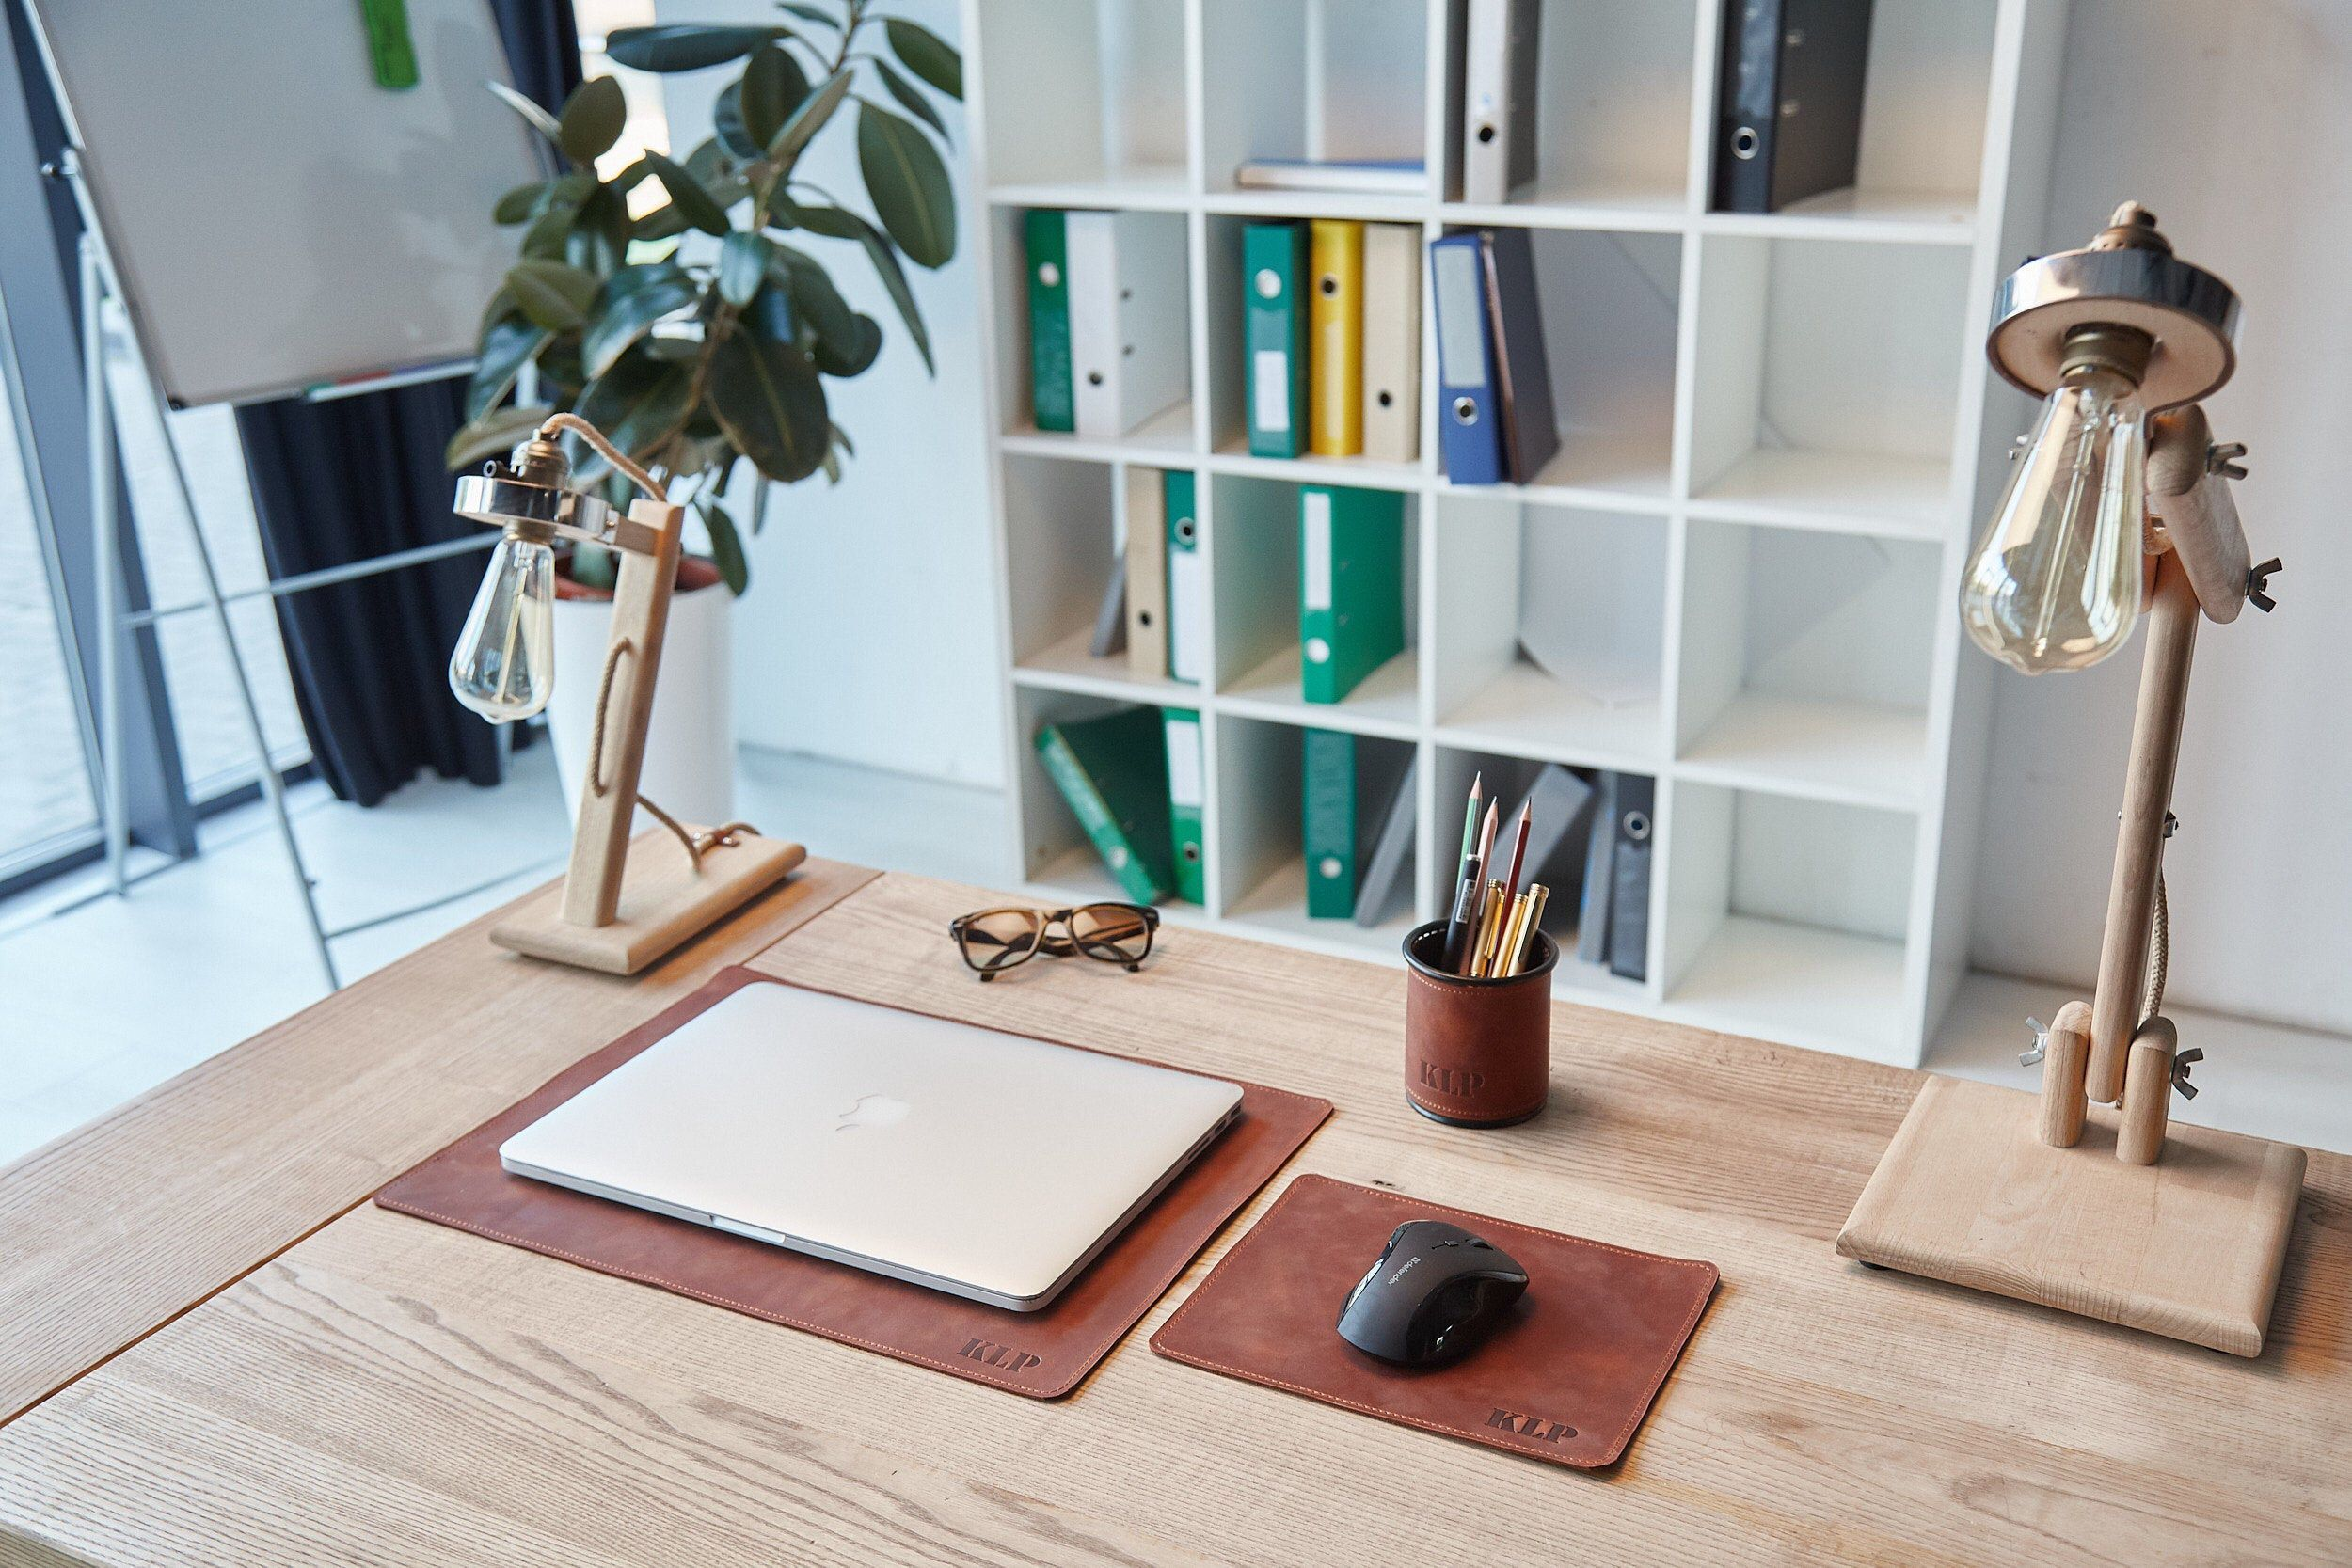 Office Desk Accessories Office Desk Accessories For Men Office Desk Accessories For Women Personalized Le Leather Desk Pad Leather Desk Desk Accessories Office